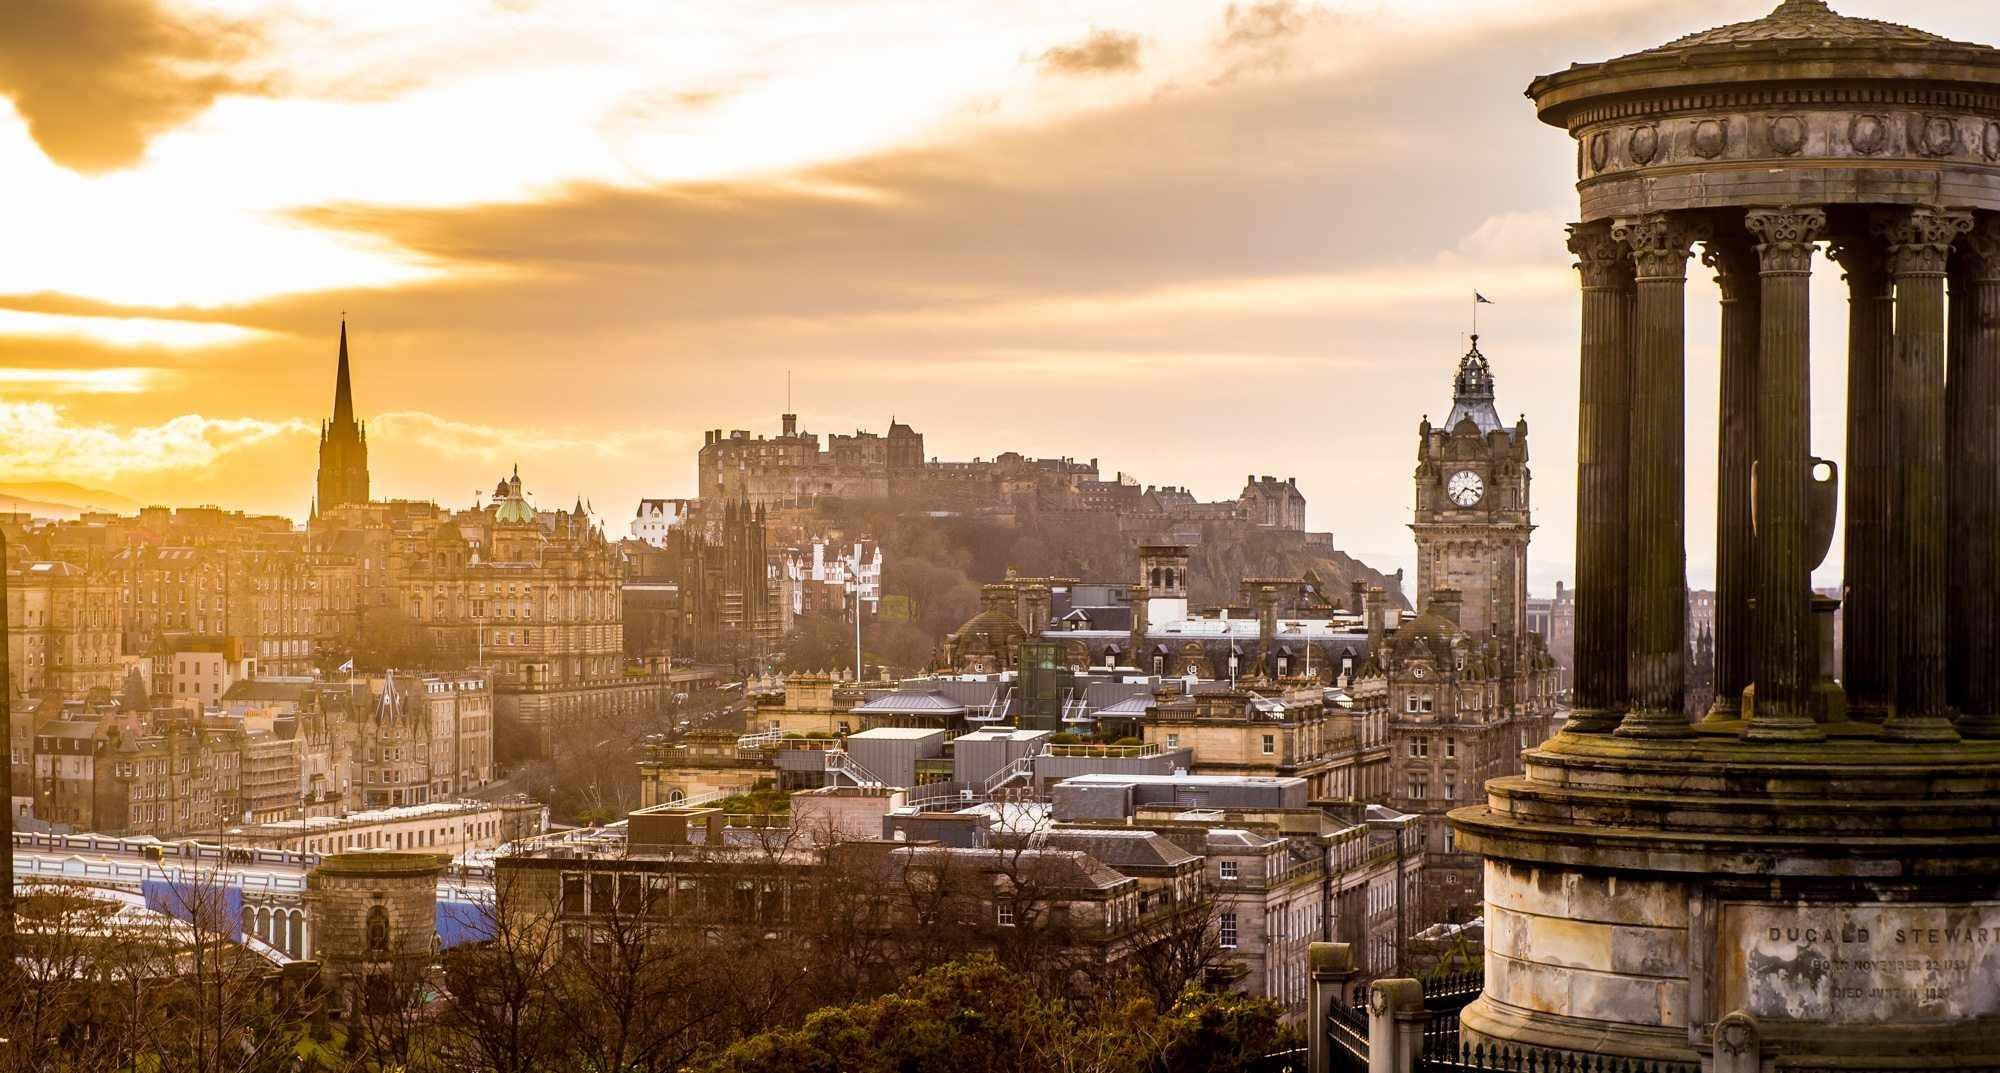 Scotland's Capital - Edinburgh